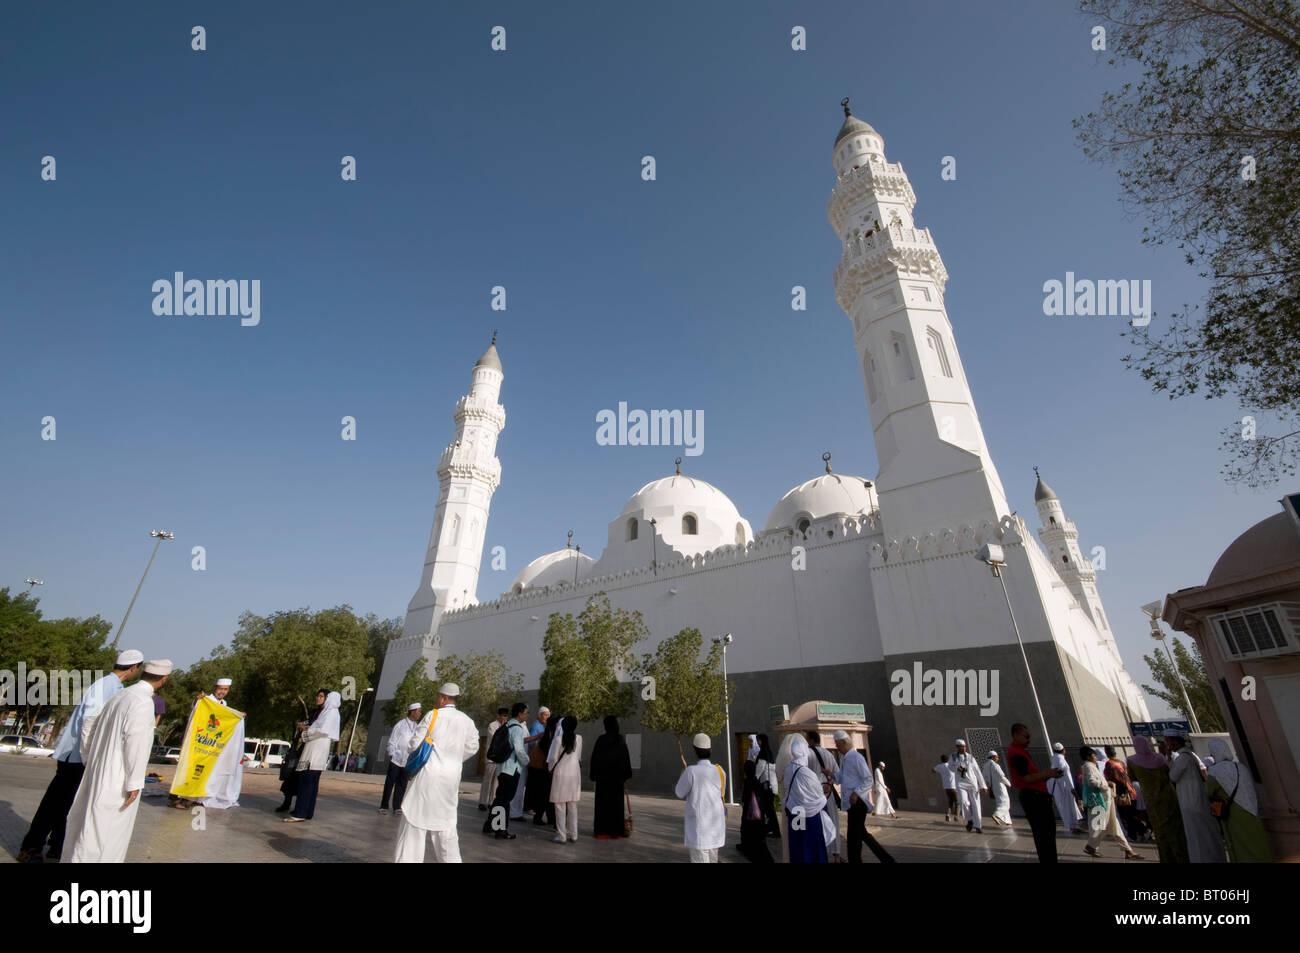 Muslime auf dem Gelände der Moschee Quba 21. April 2010 in Medina, Saudi-Arabien. Stockbild